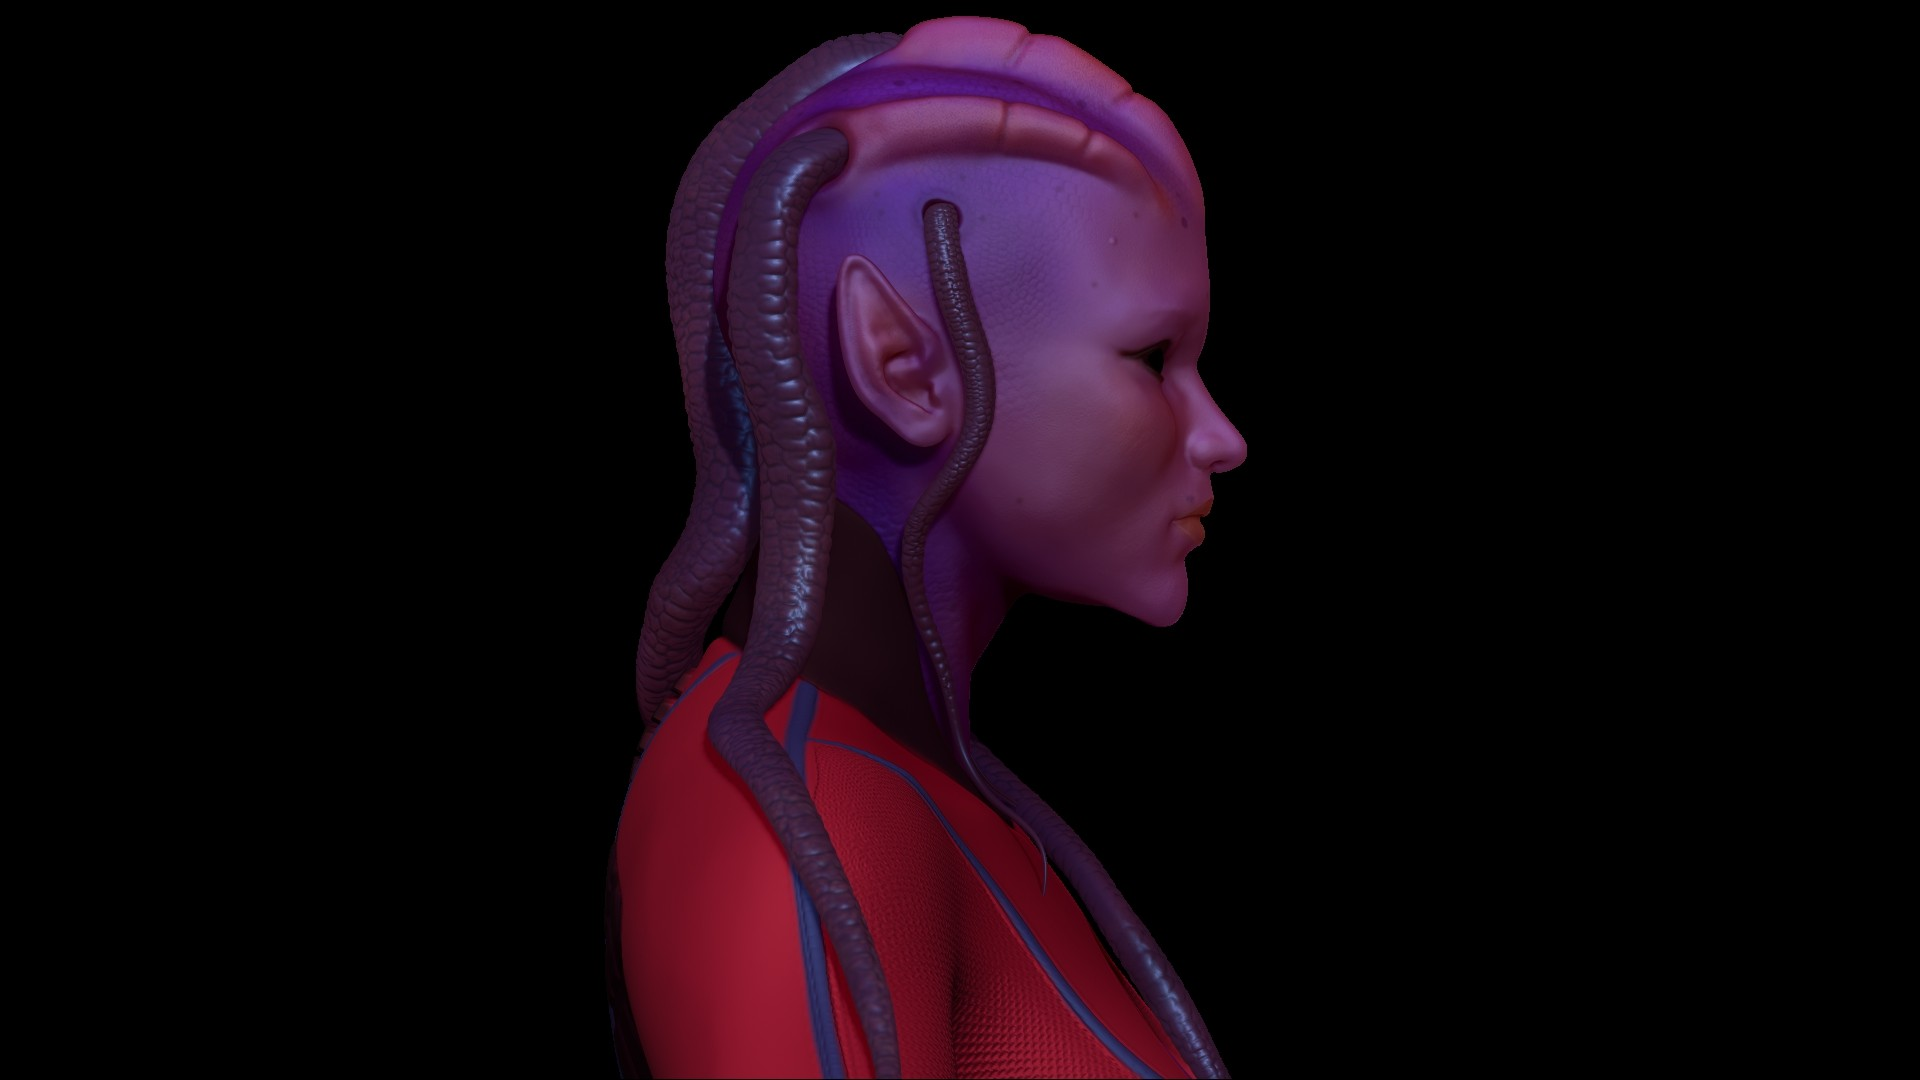 Chris rena avatar character side render